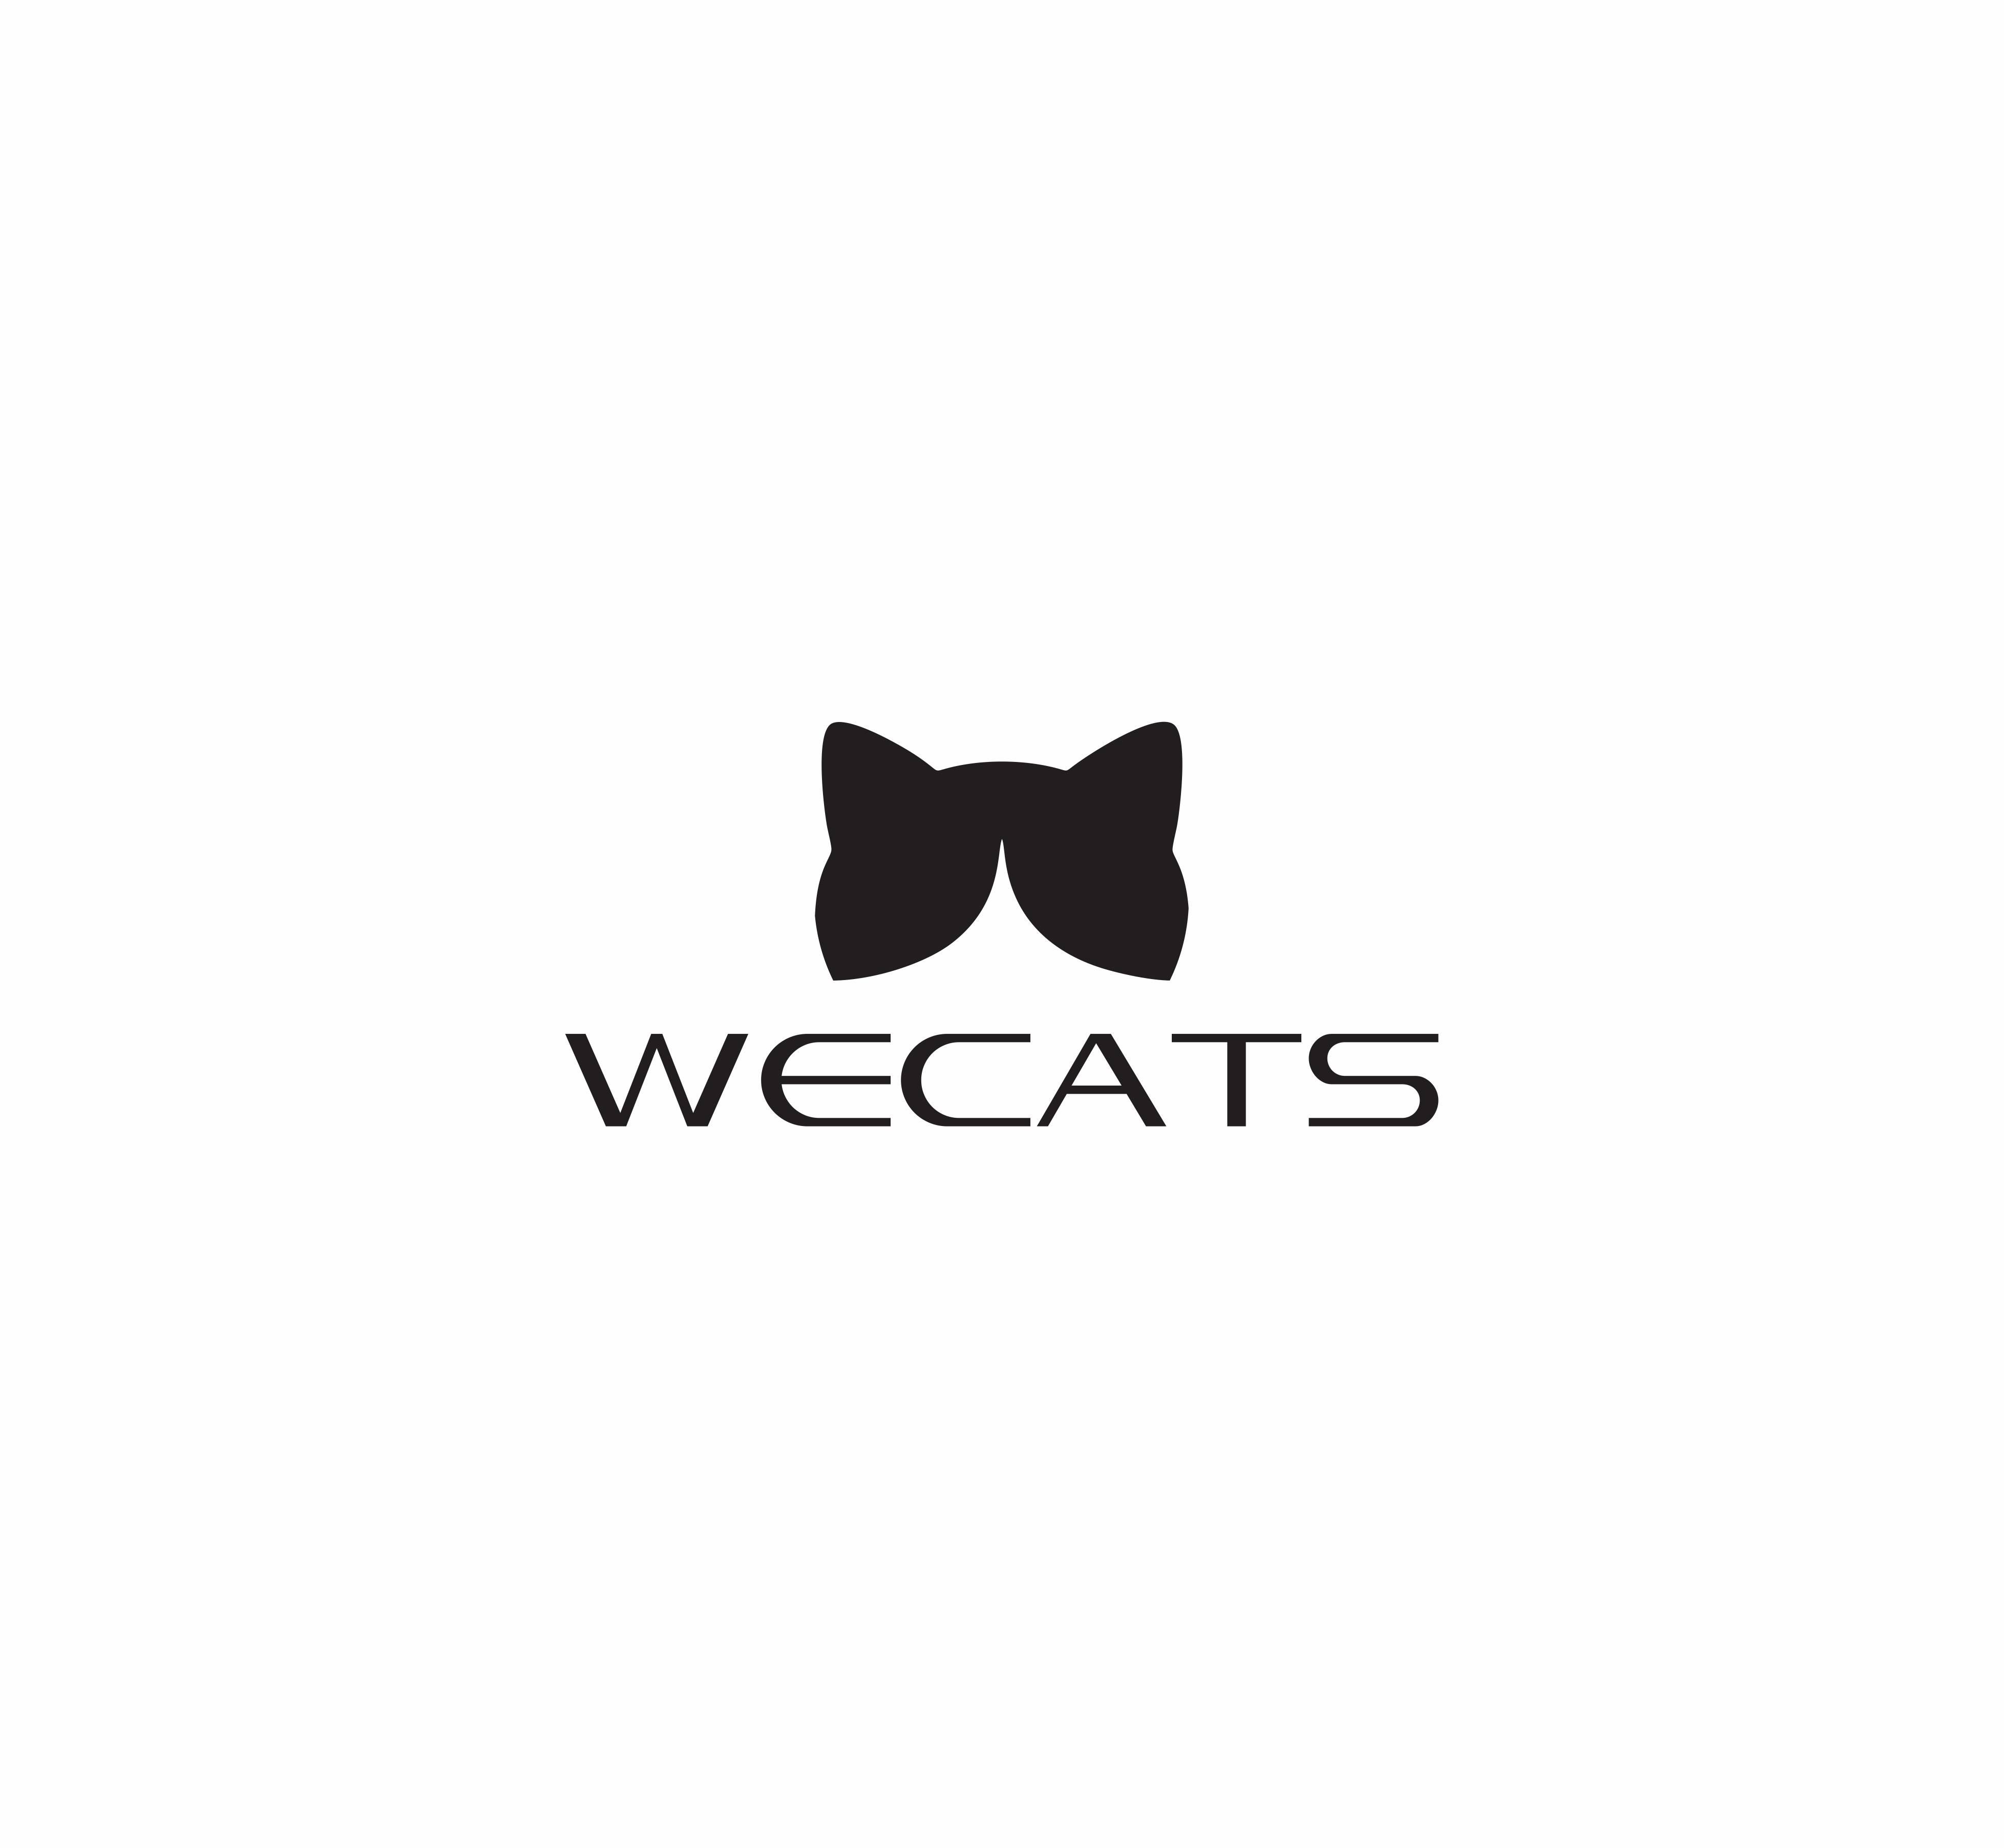 Создание логотипа WeCats фото f_2645f1925e02dfdd.jpg